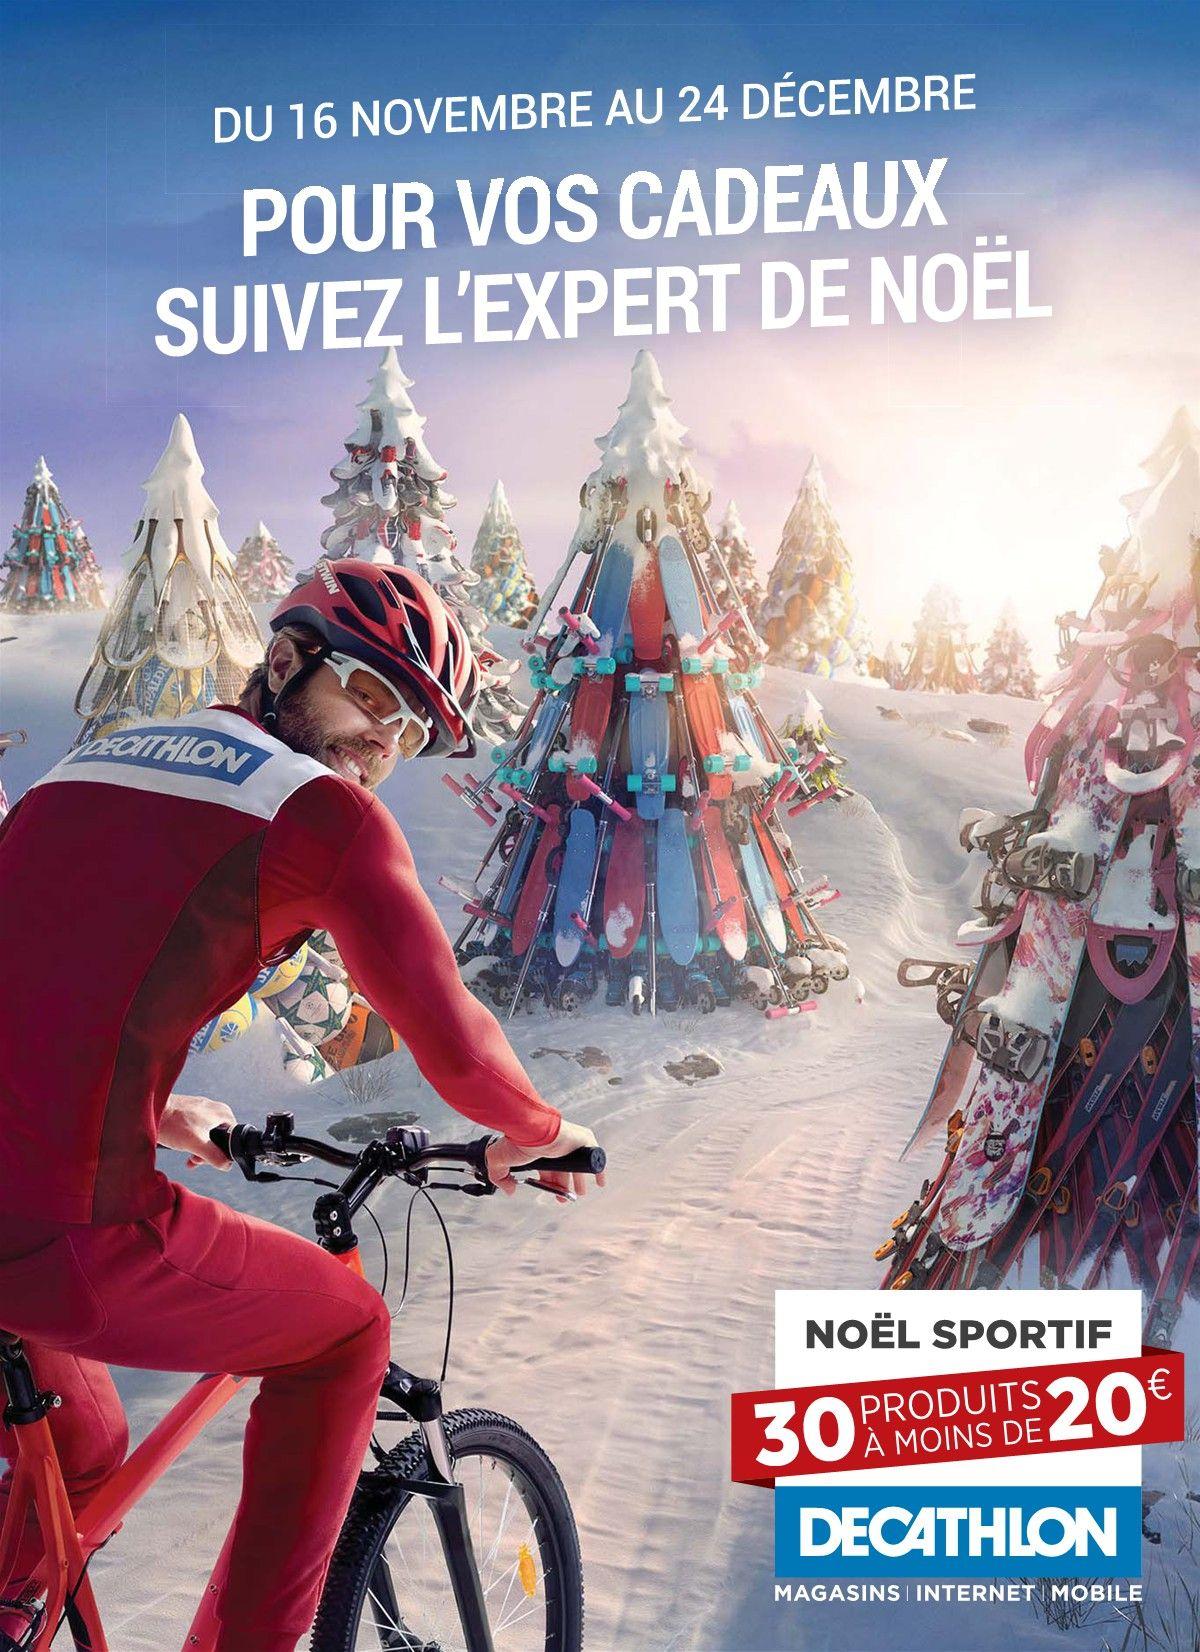 catalogue decathlon noel 2018 Catalogue de sport OP Noël   DECATHLON | Catalogues Noel  catalogue decathlon noel 2018